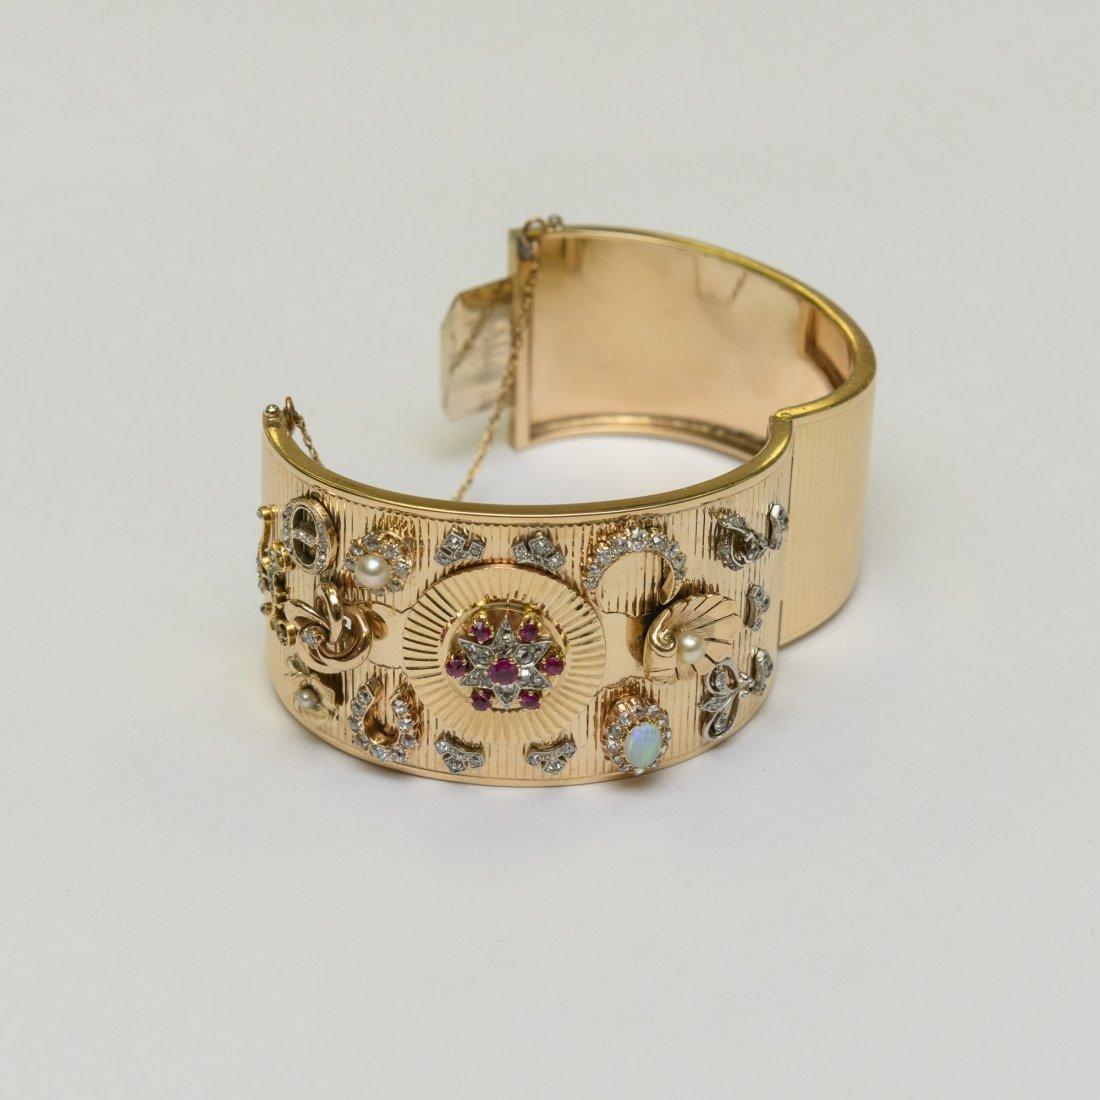 A Bangle Bracelet with 2.13 Ctw Diamonds